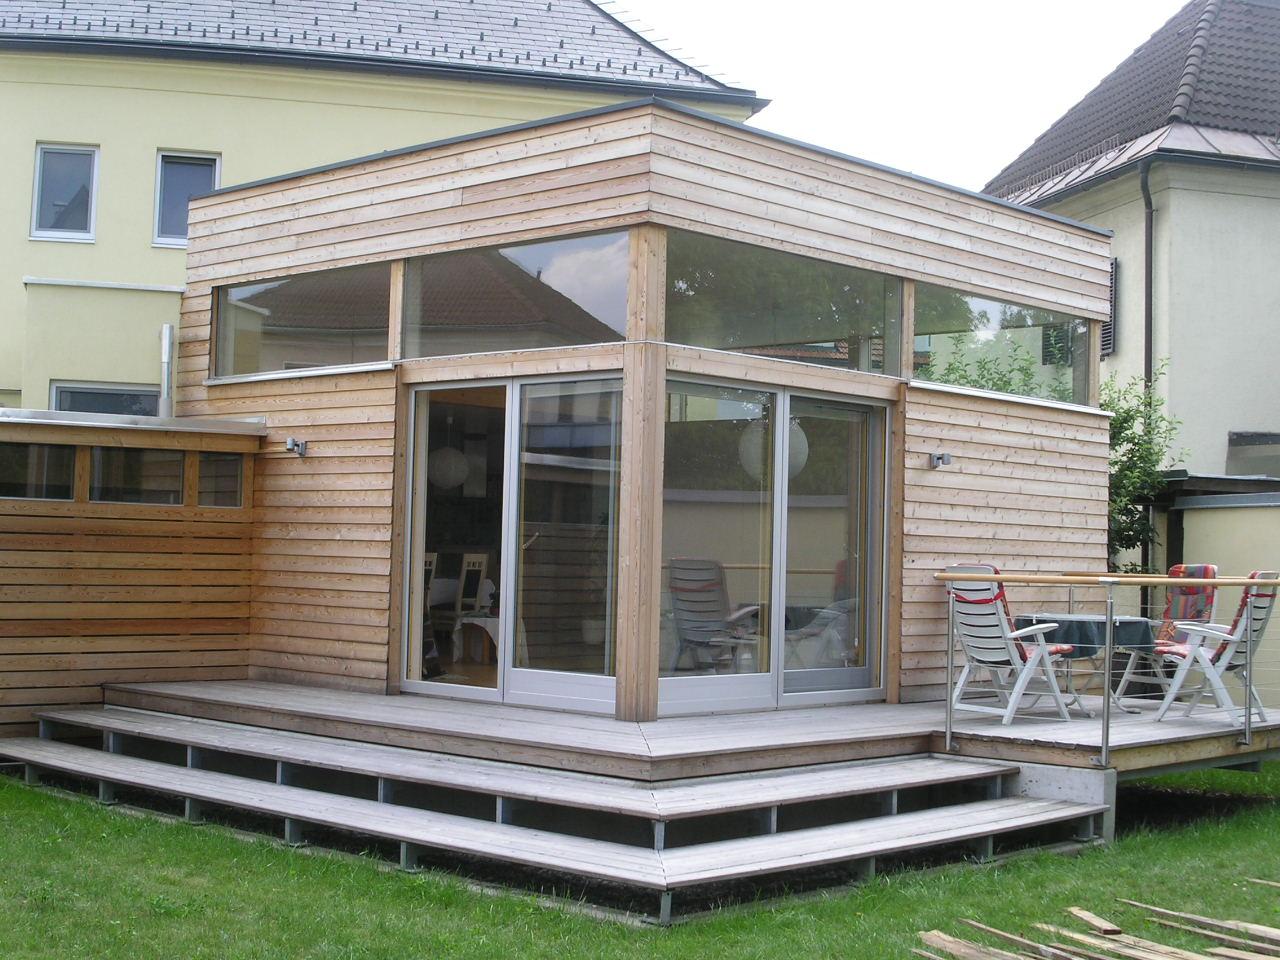 Duhs & Bergmann Bau u Zimmereiunternehmen Ges.m.b.H.